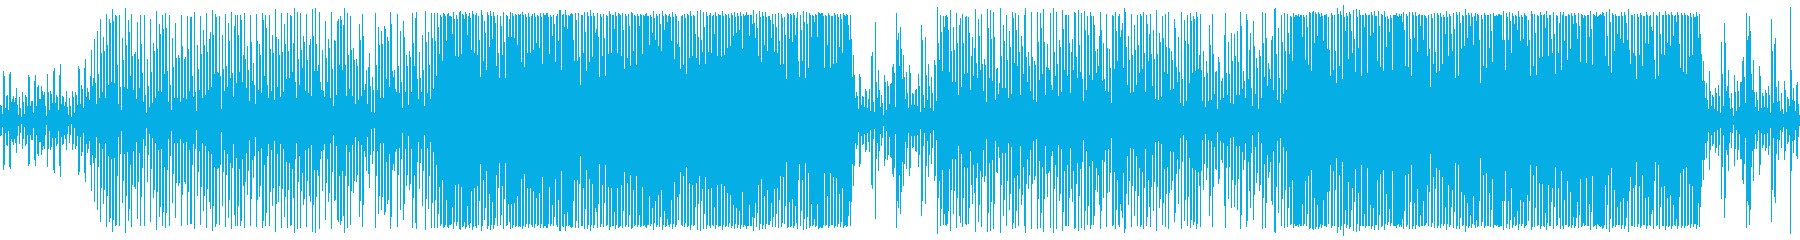 Heartful Musicの再生済みの波形